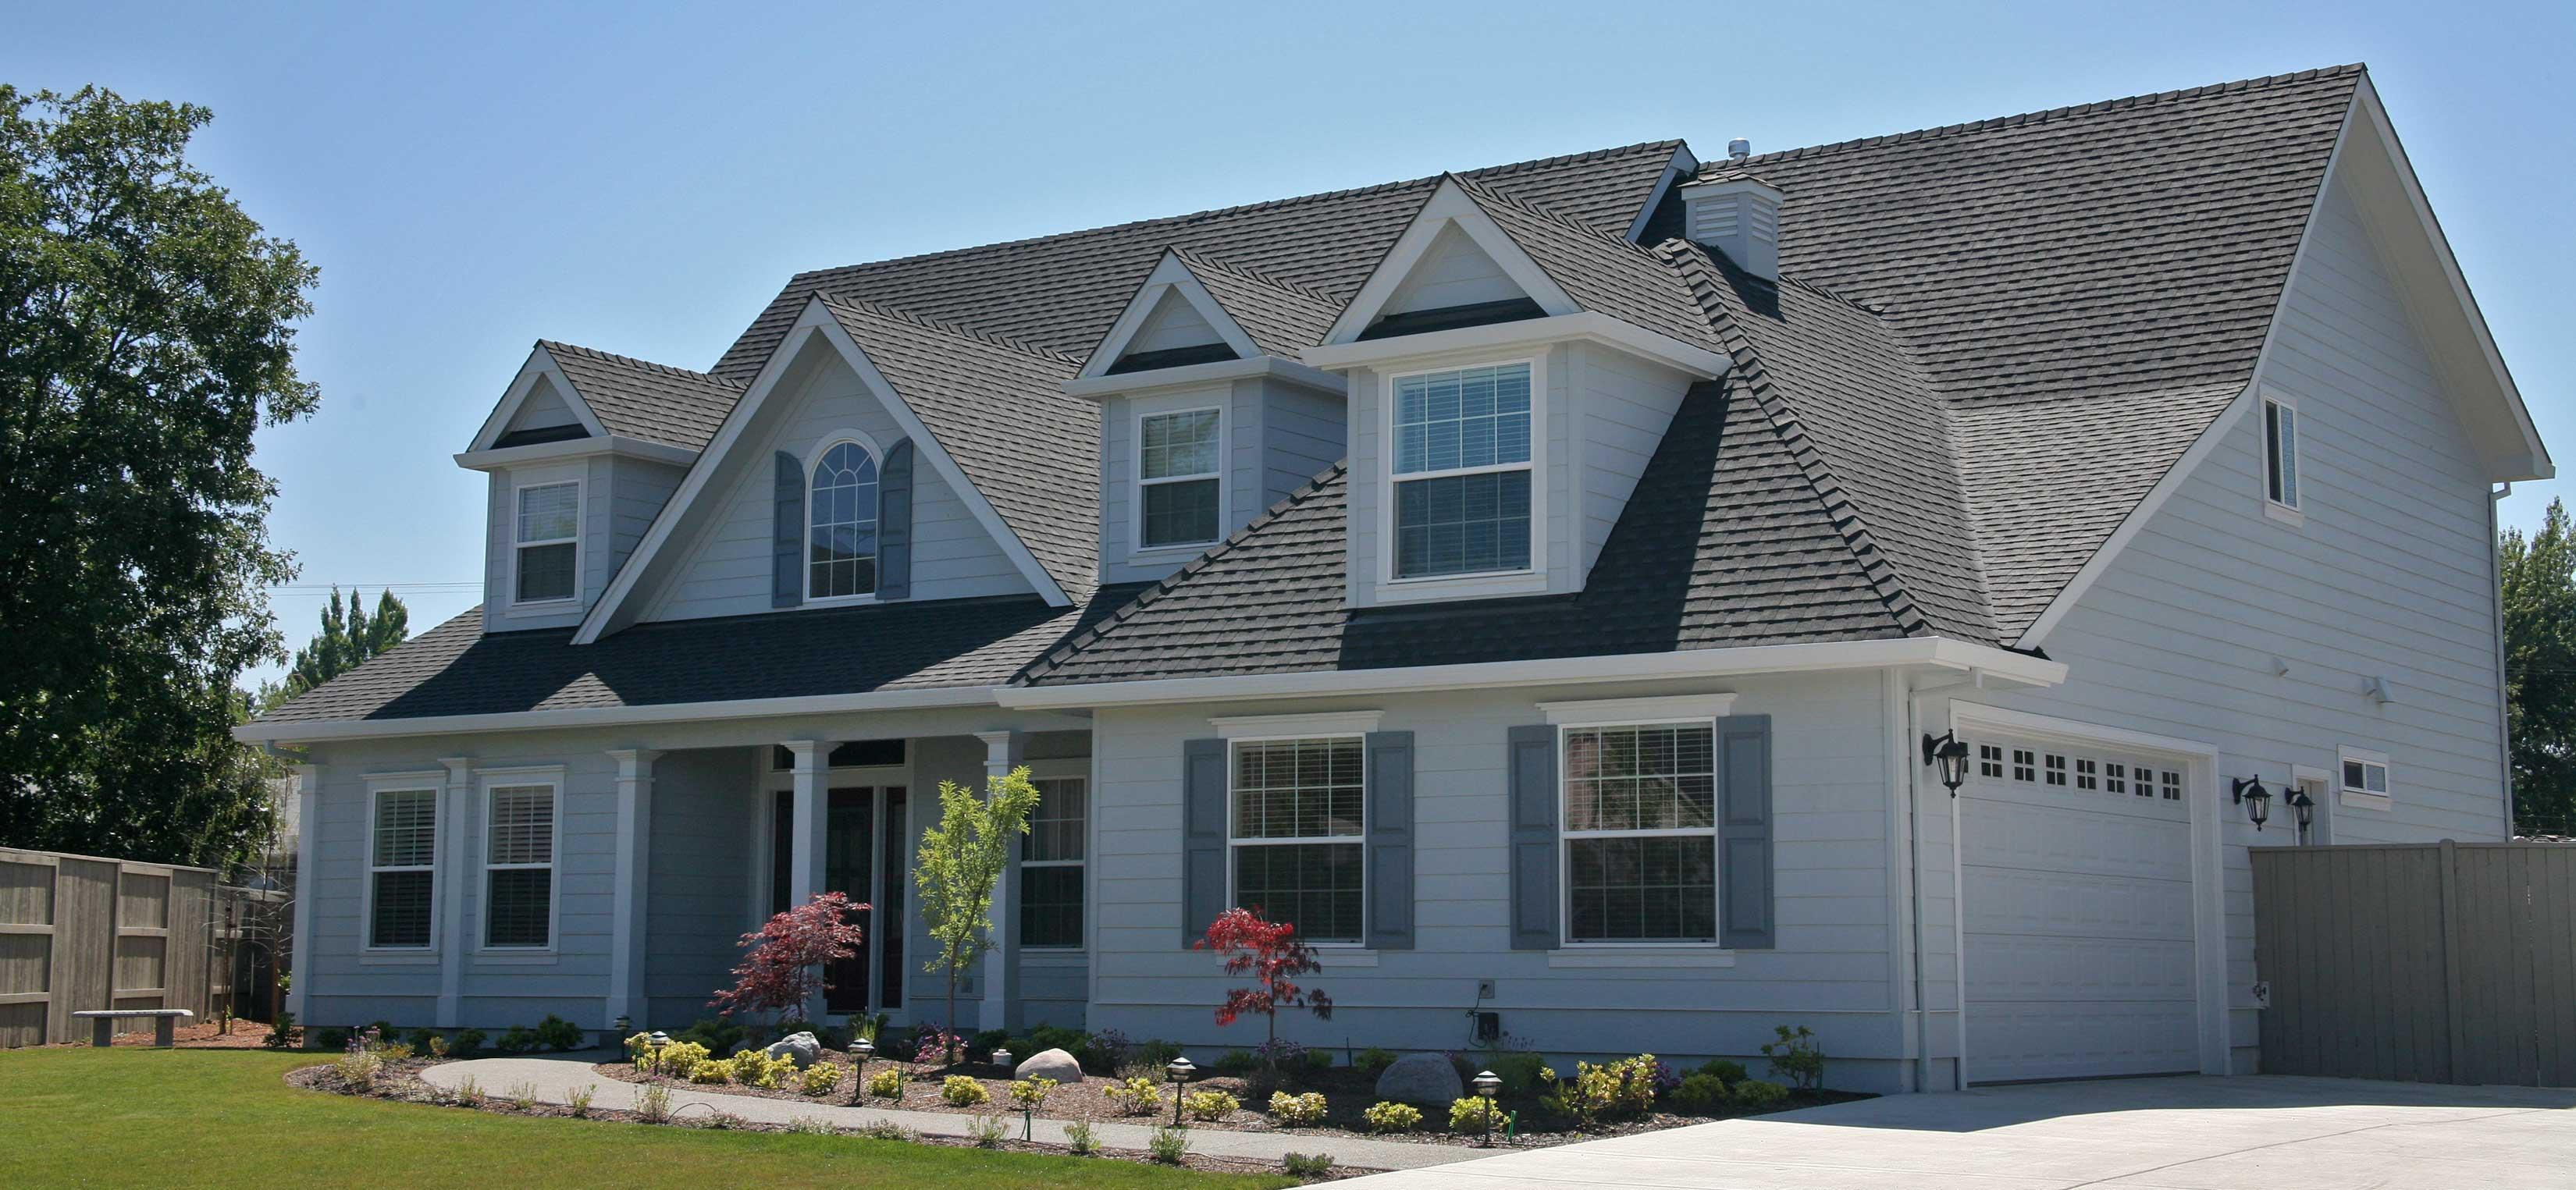 Siding & Roofing contractors | repair | replacement New Lenox, IL | Joliet IL | Plainfield | Chicago SW Burbs